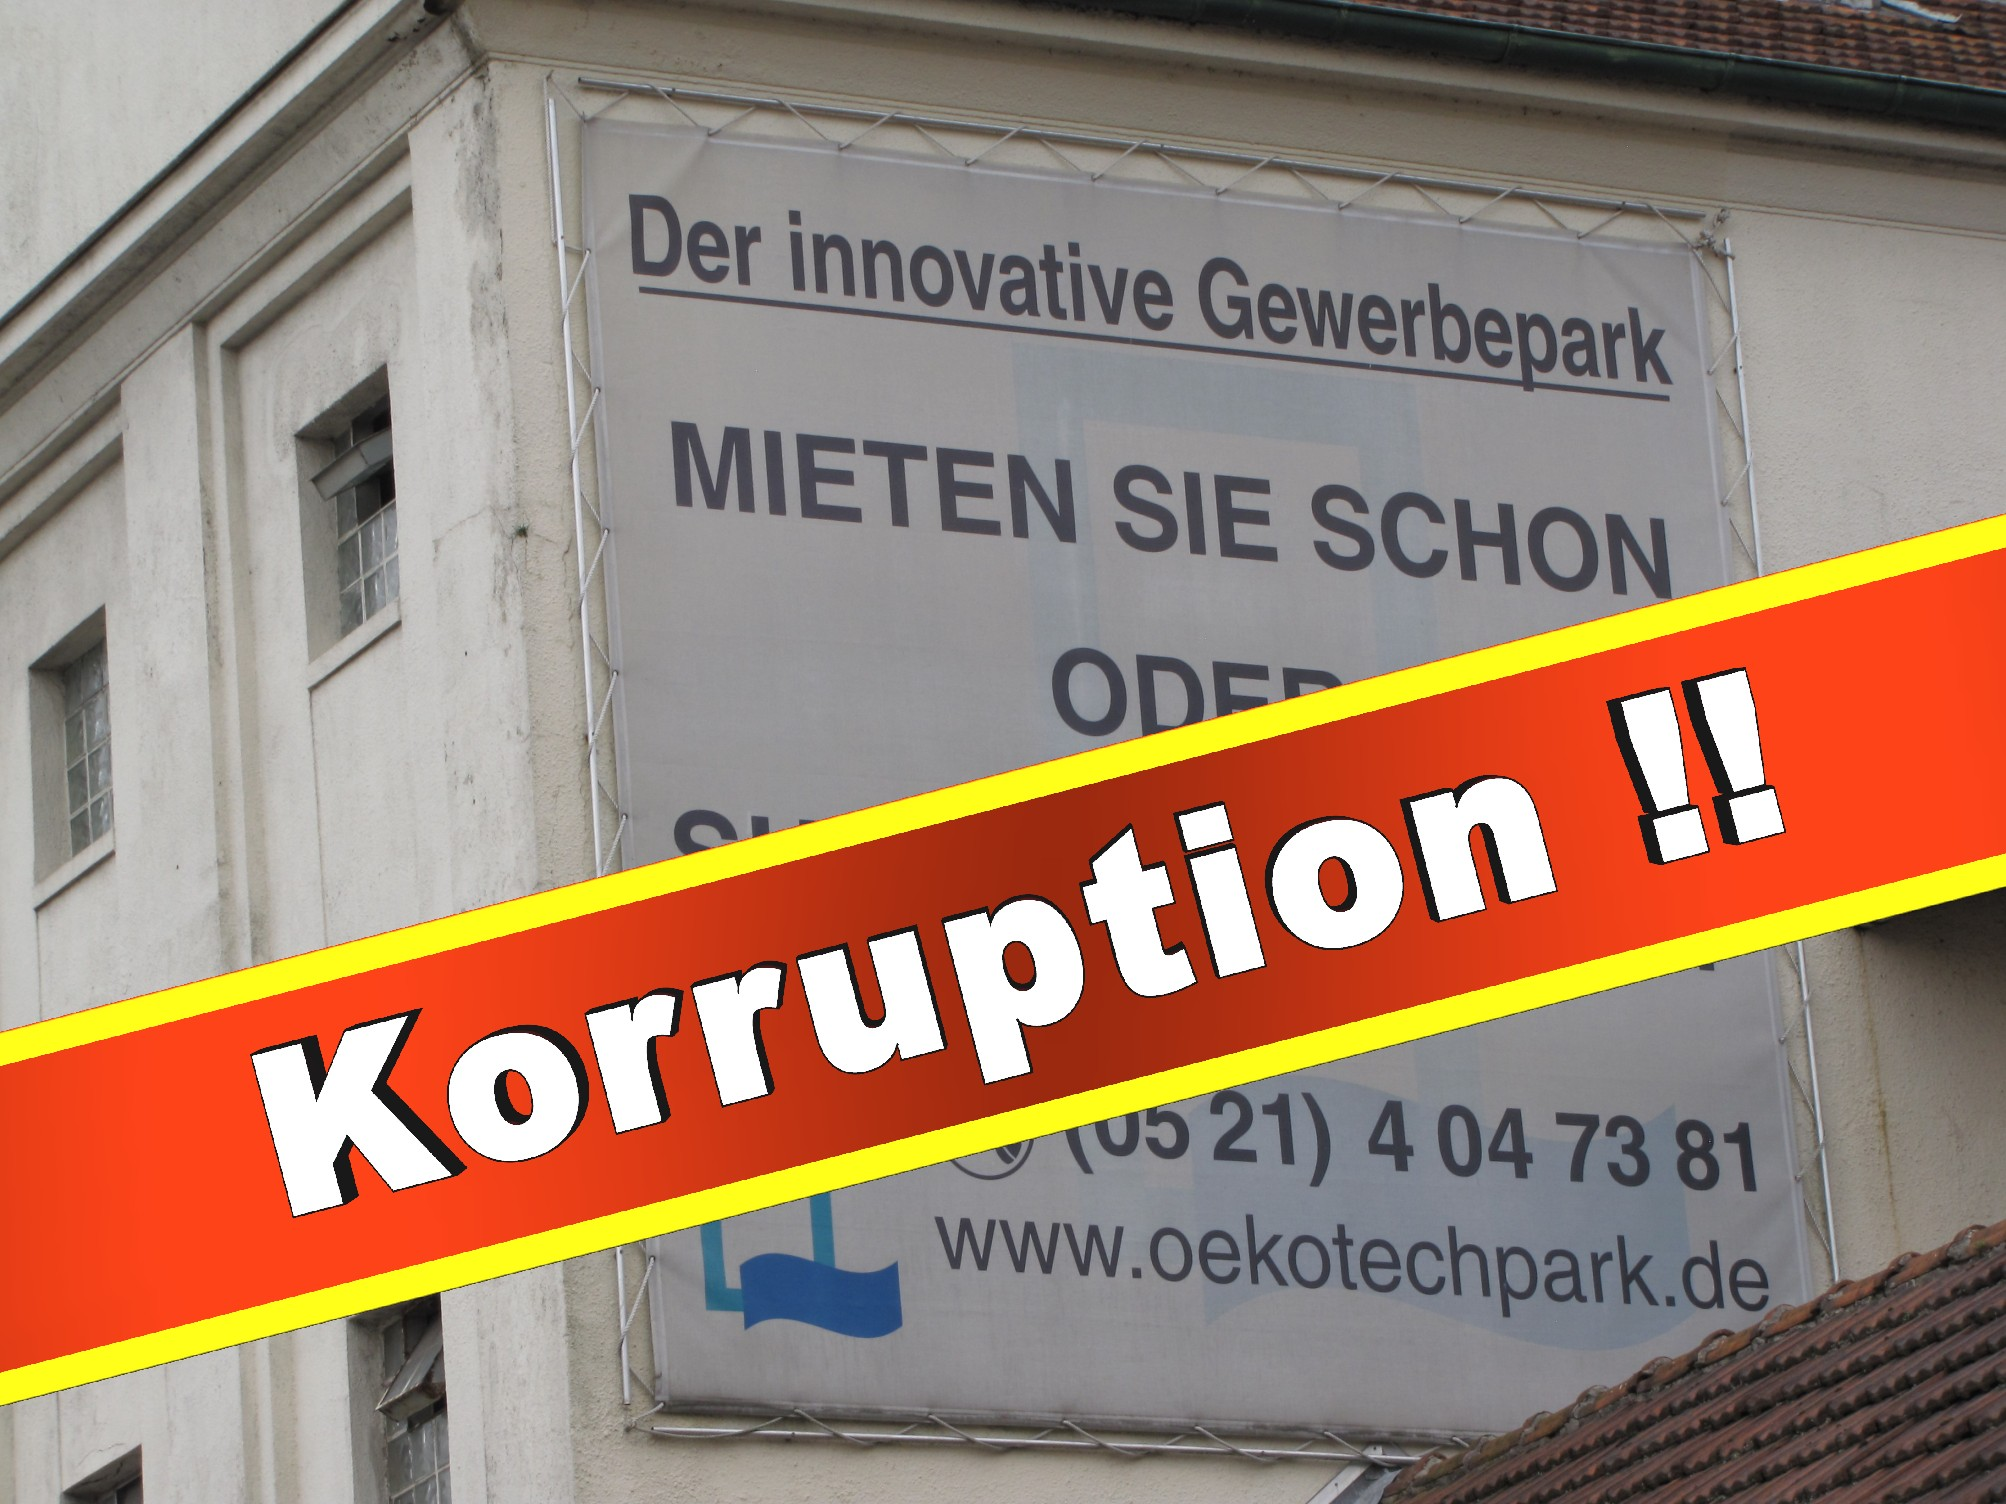 Windel Oeko Tech Park Windelsbleiche Bielefeld (64)